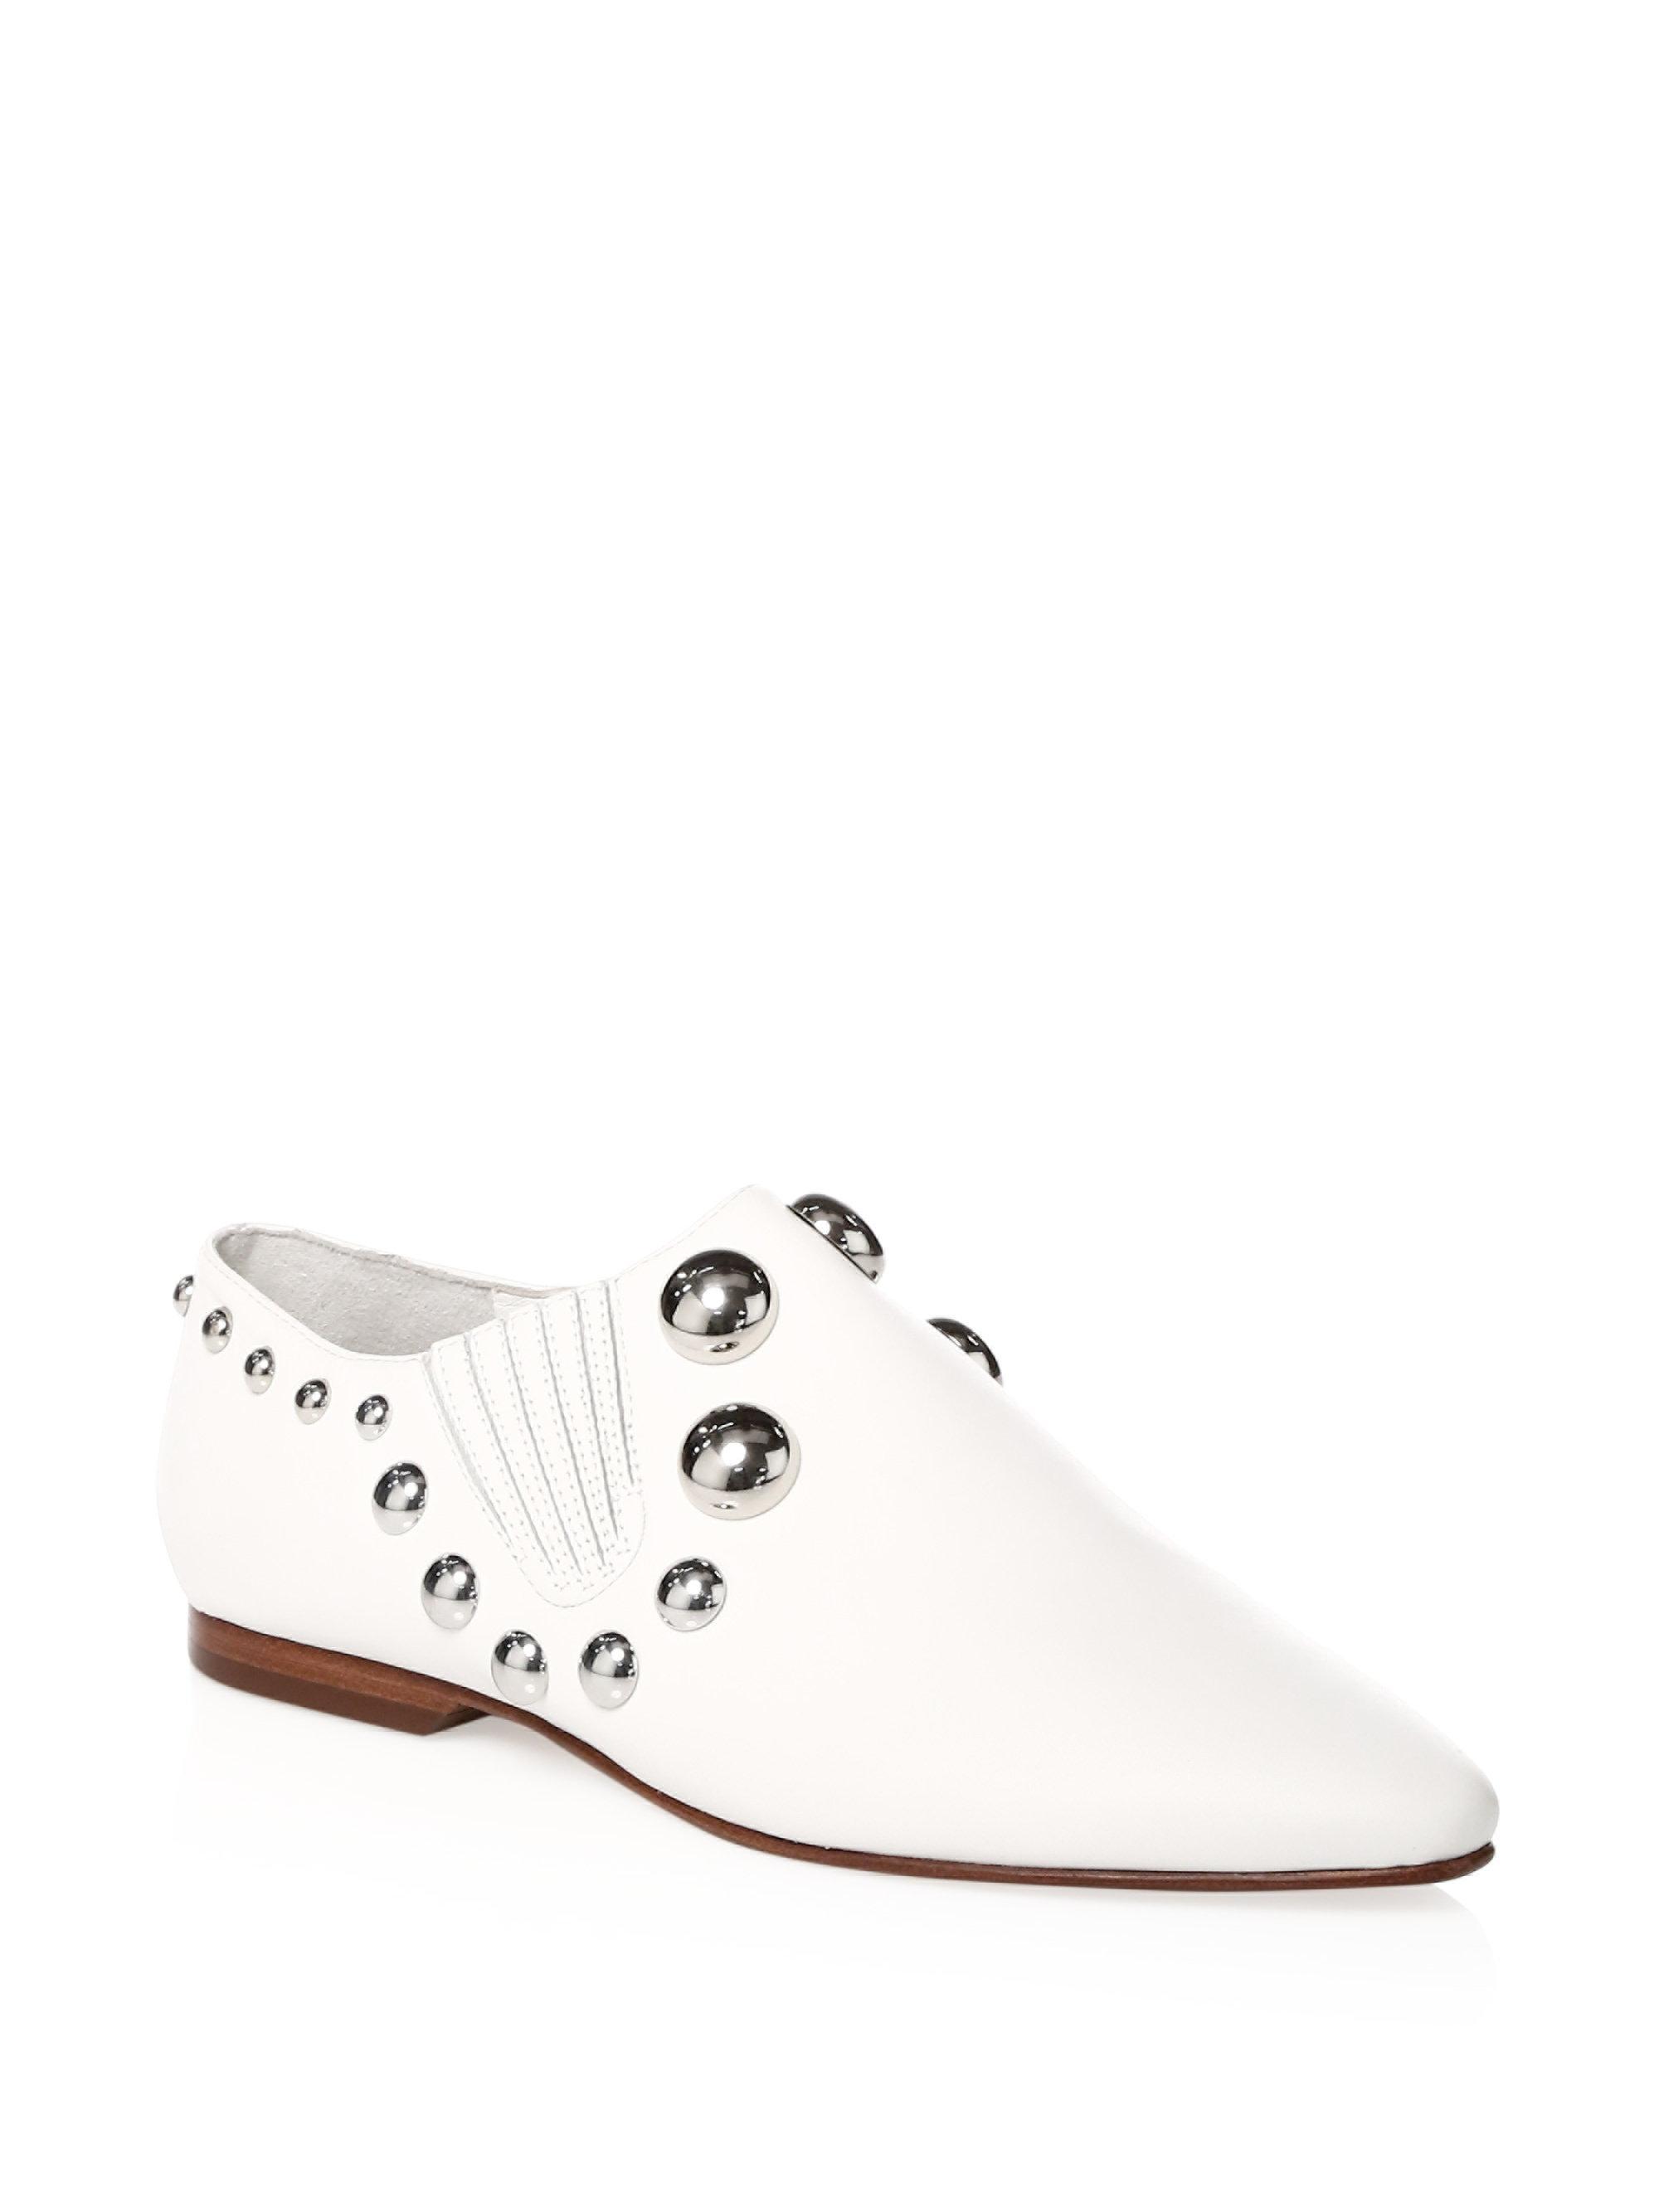 Tory Burch Blythe Studded Leather Point-Toe Loafers N7AR2O7jl